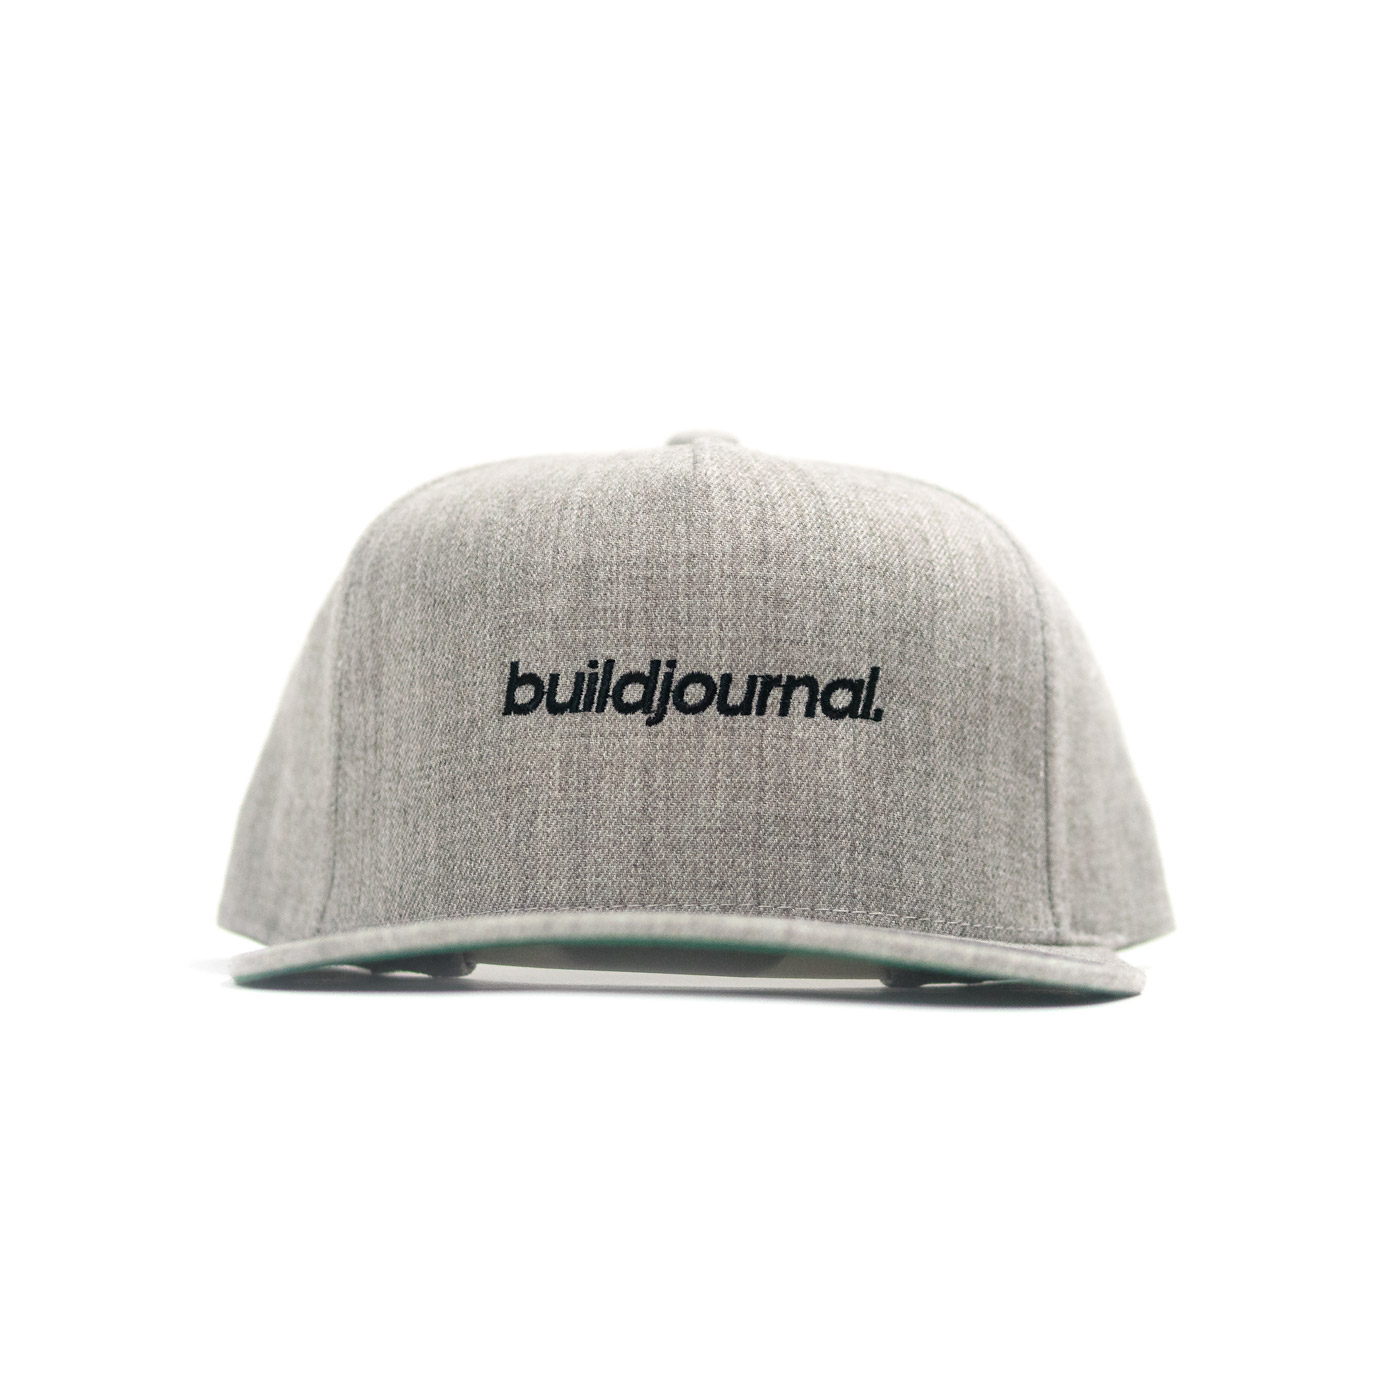 Buildjournal Signature Snapback Hat